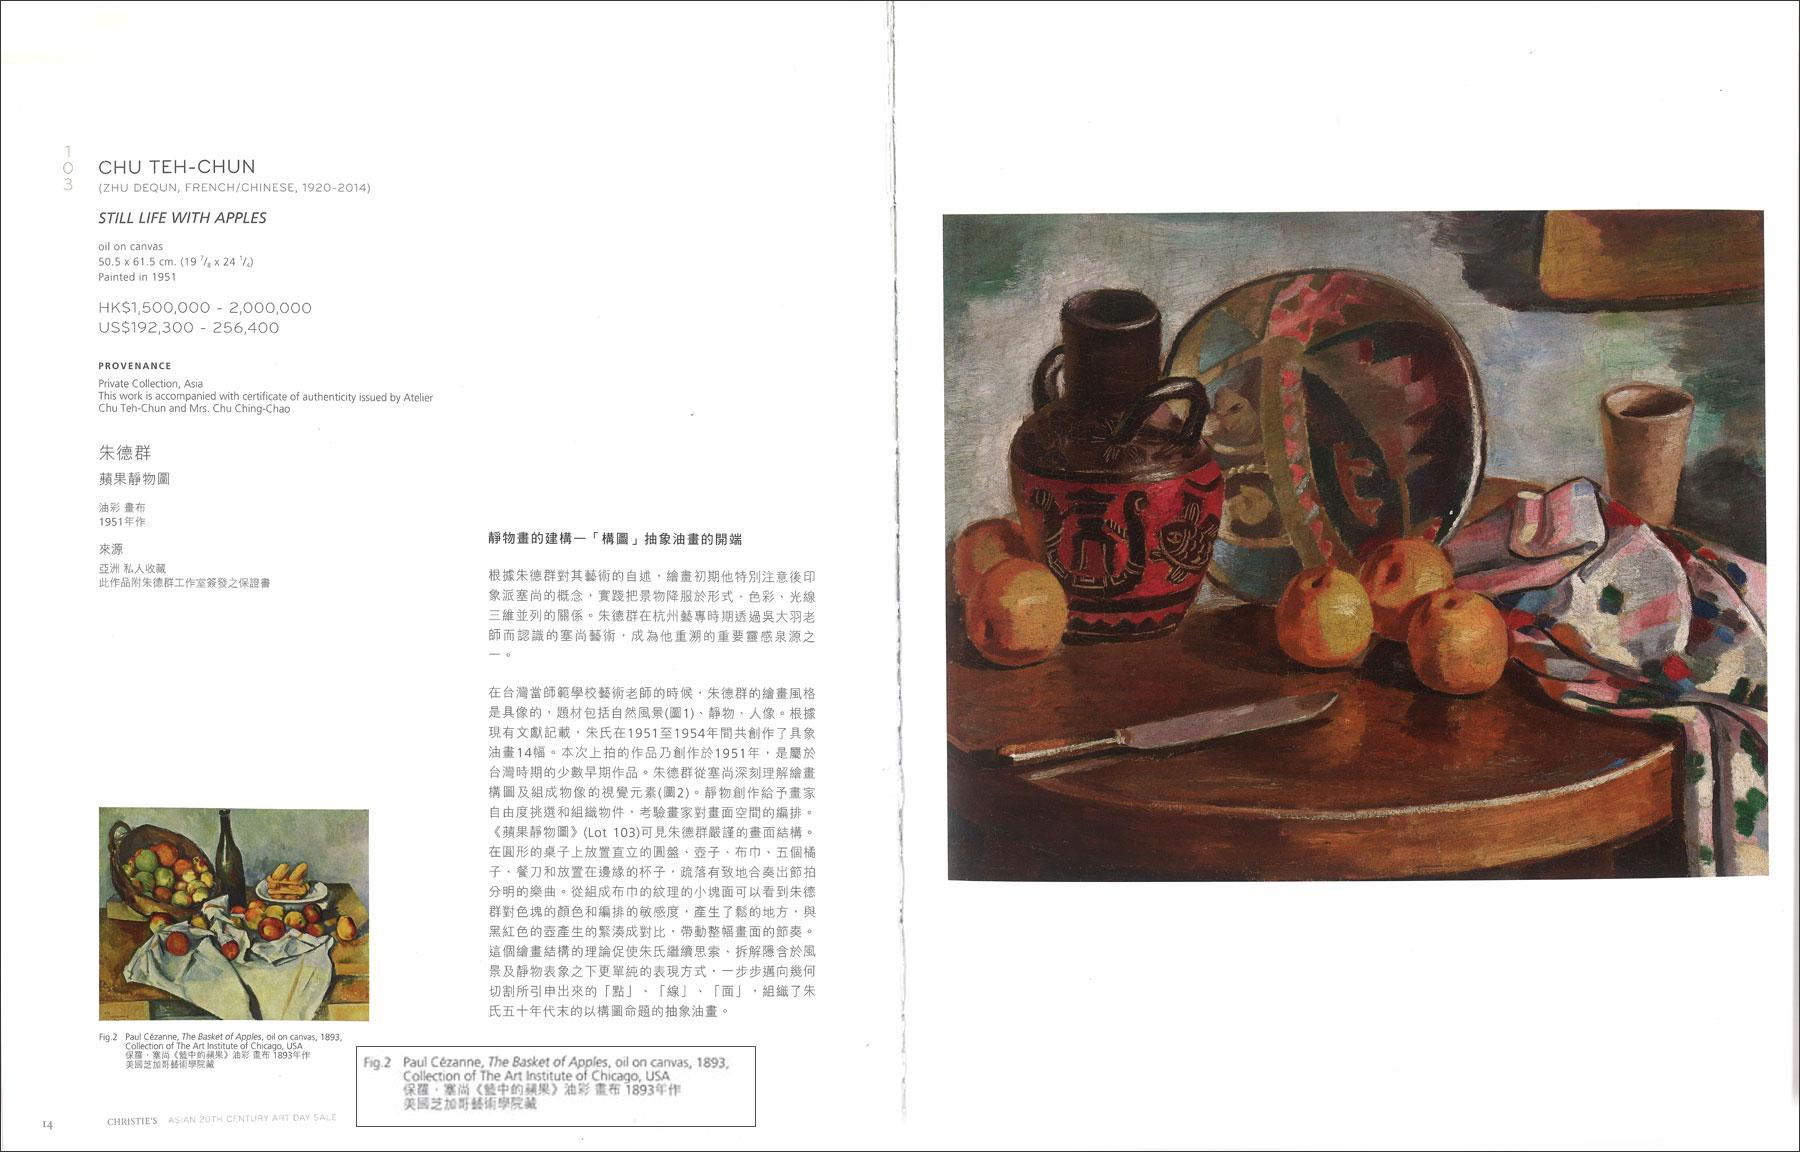 Chu Teh-Chun painting with Paul-Cezanne painting